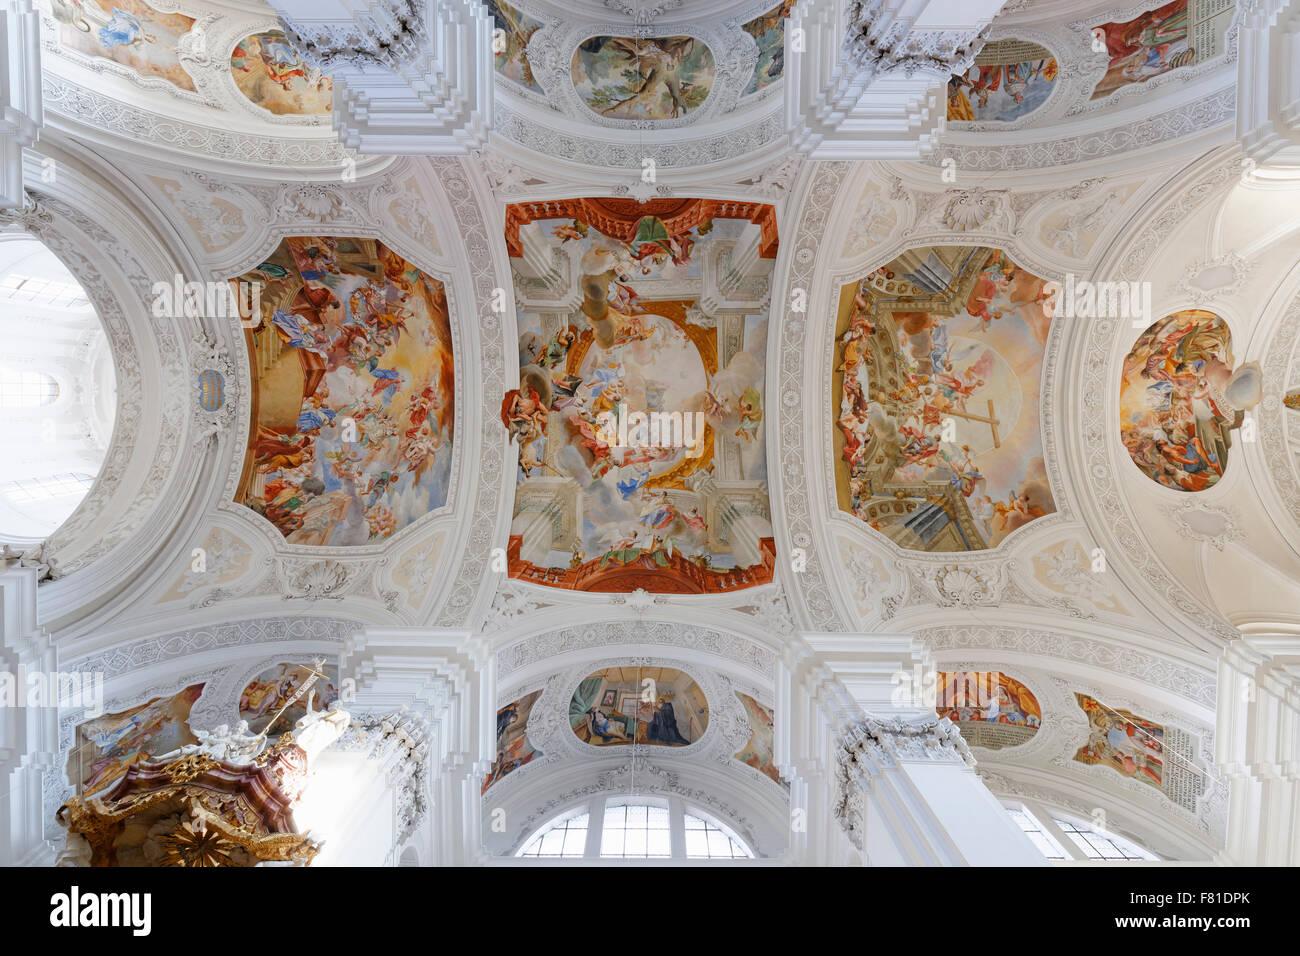 Ceiling frescoes by Cosmas Damian Asam, Basilica of St. Martin, Weingarten, Upper Swabia, Baden-Württemberg, - Stock Image